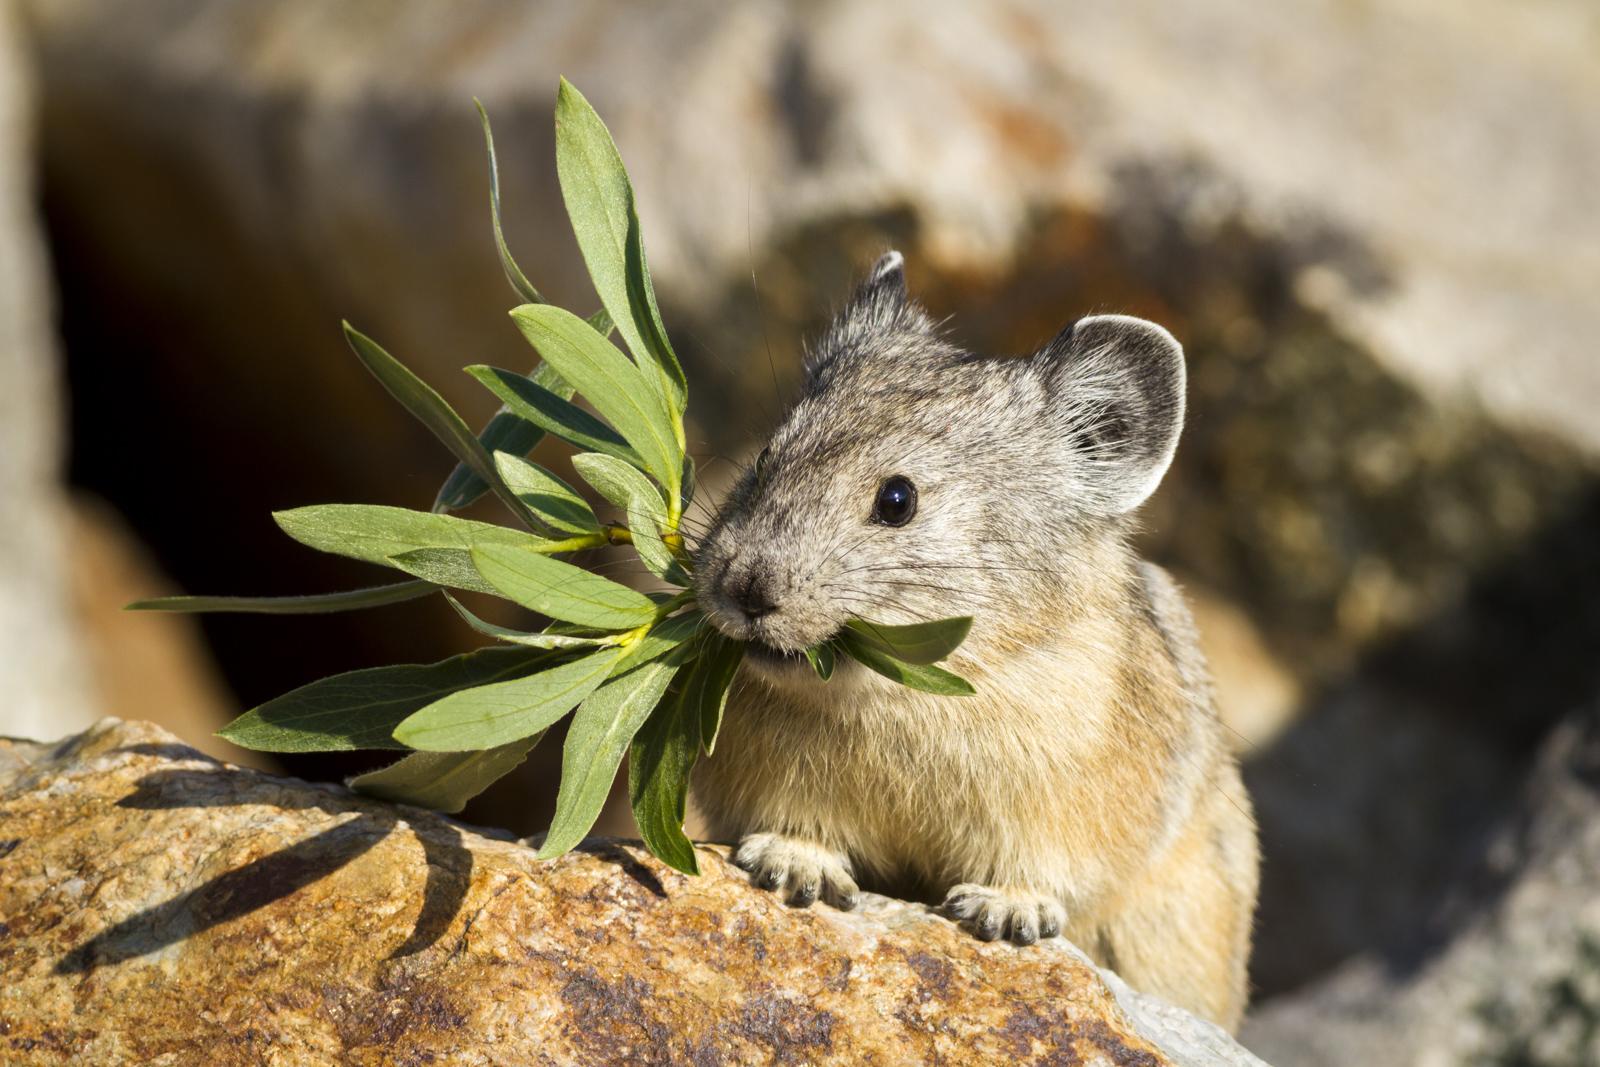 California, USA, Wildlife, Yosemite, animal, beautiful, behavior, cute, feelings, mammals, national, nature, outdoor, park, photo